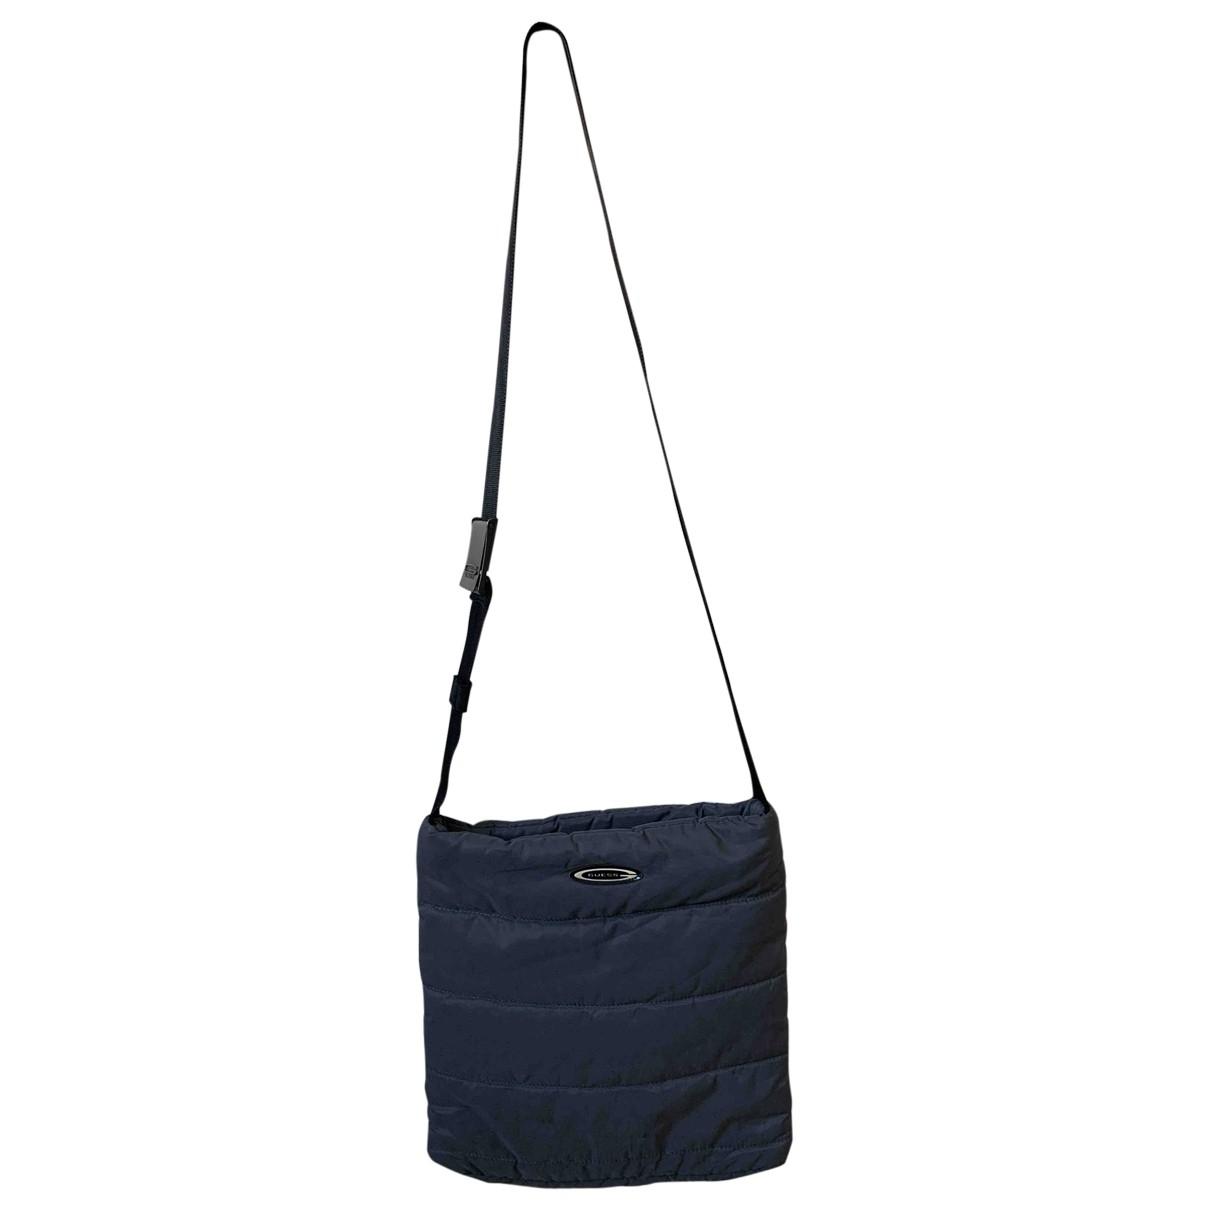 Guess \N Grey handbag for Women \N